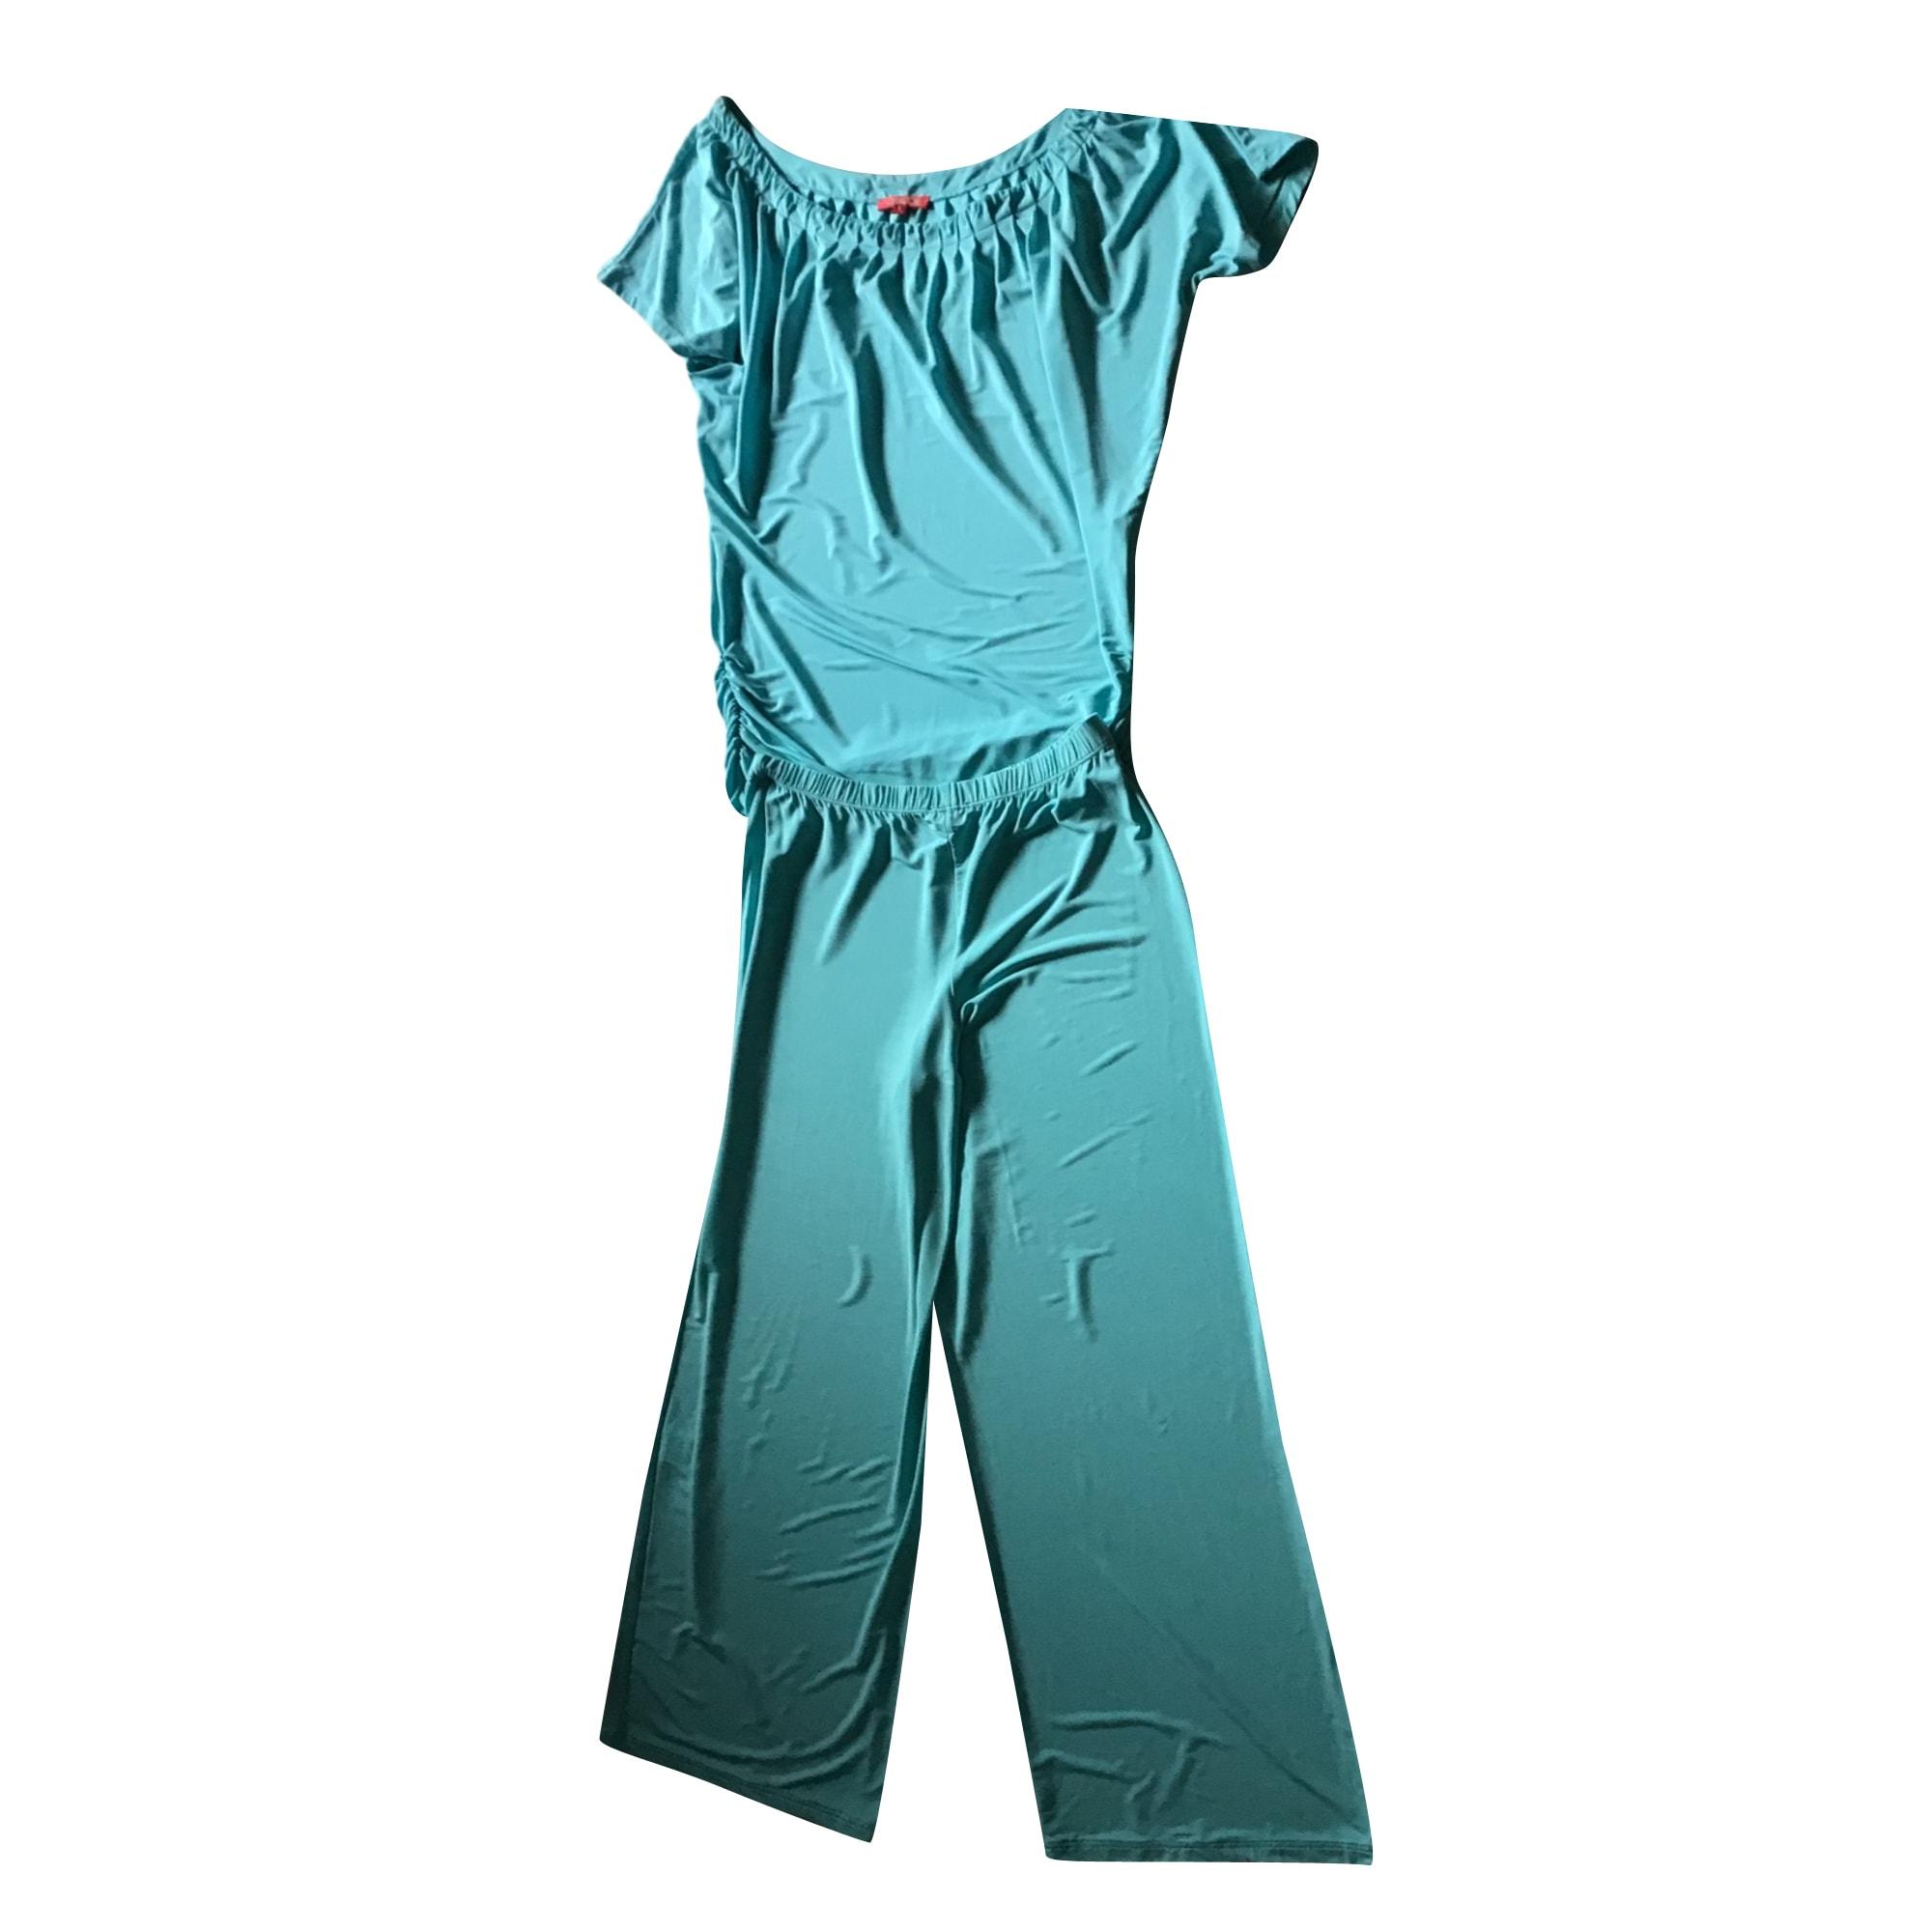 Tailleur pantalon CHACOK Bleu, bleu marine, bleu turquoise